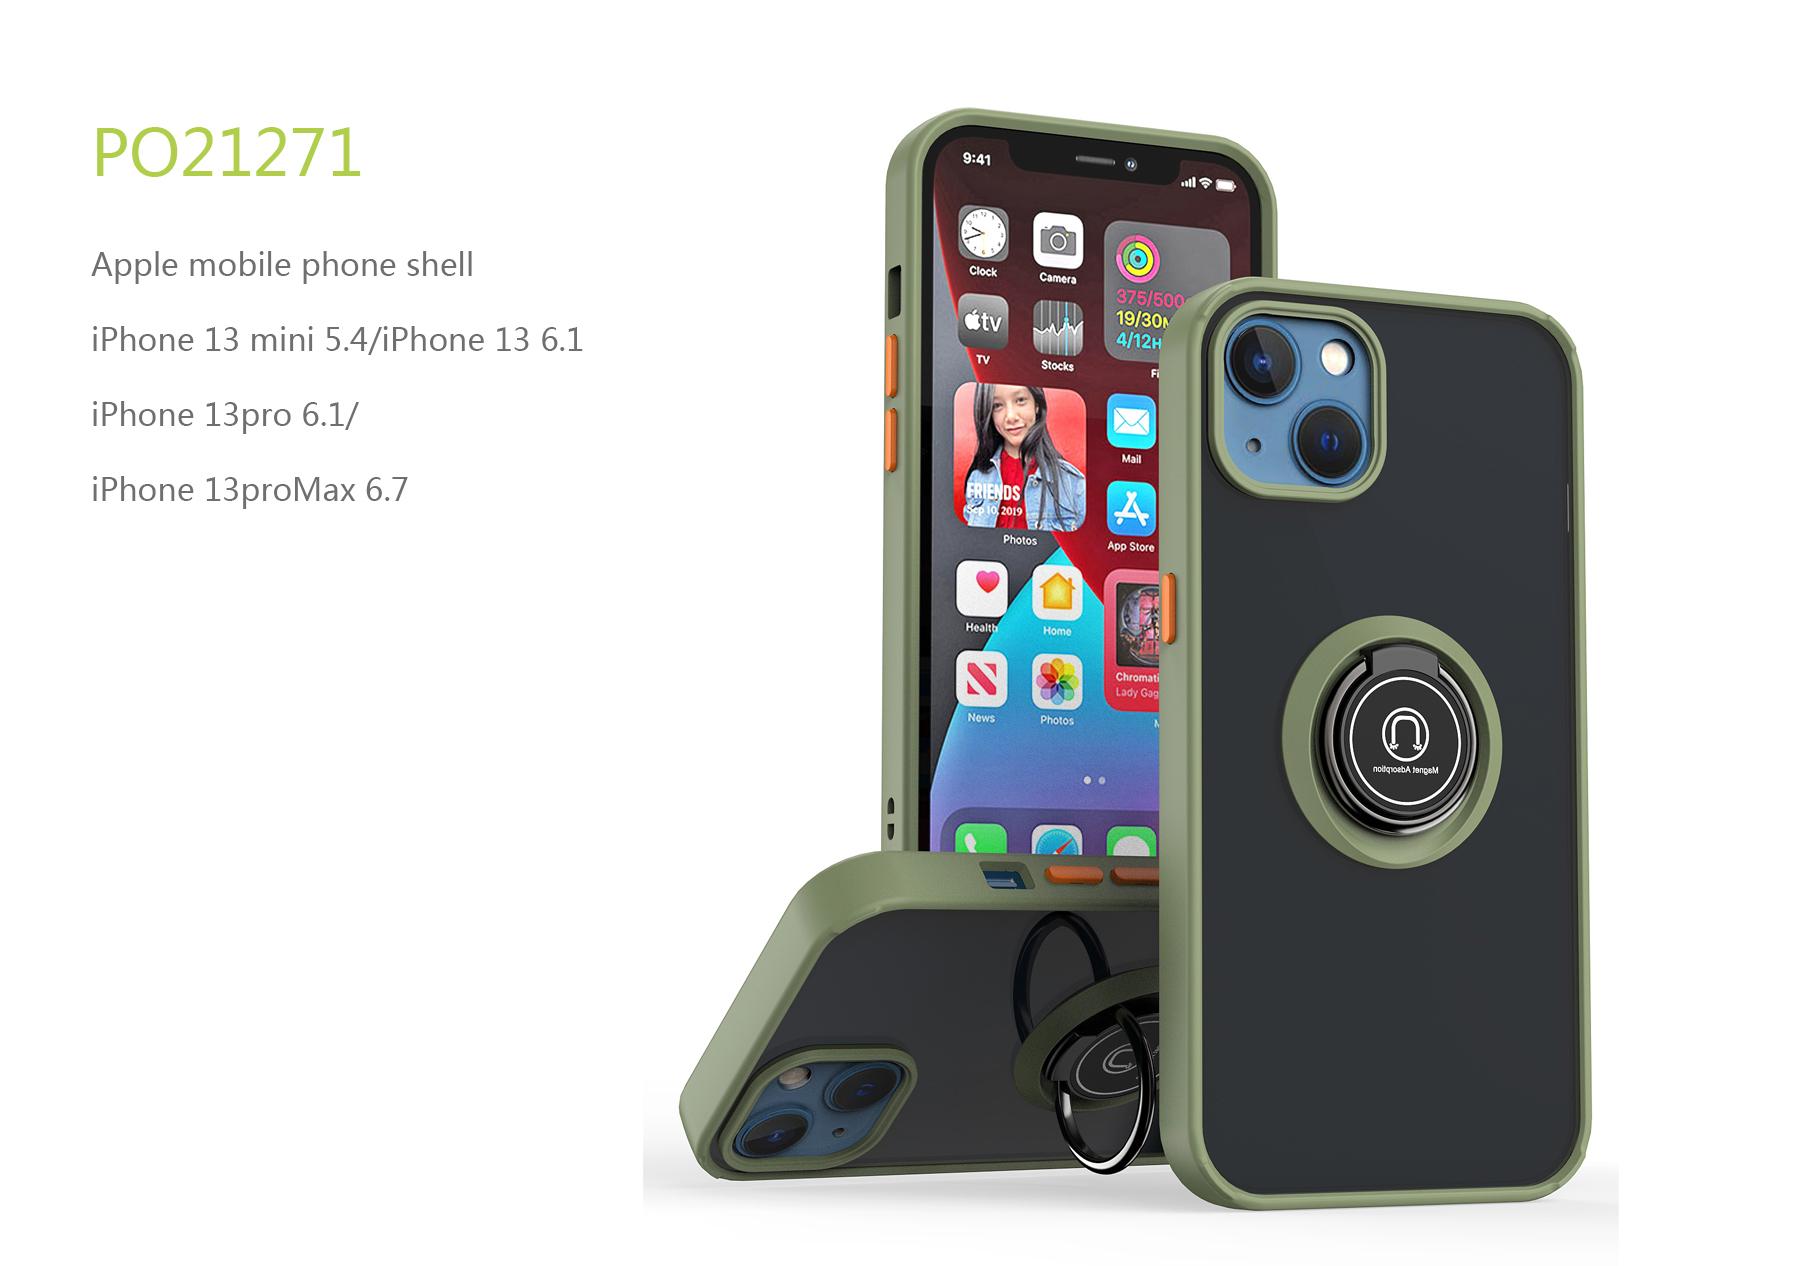 Apple mobile phone shell